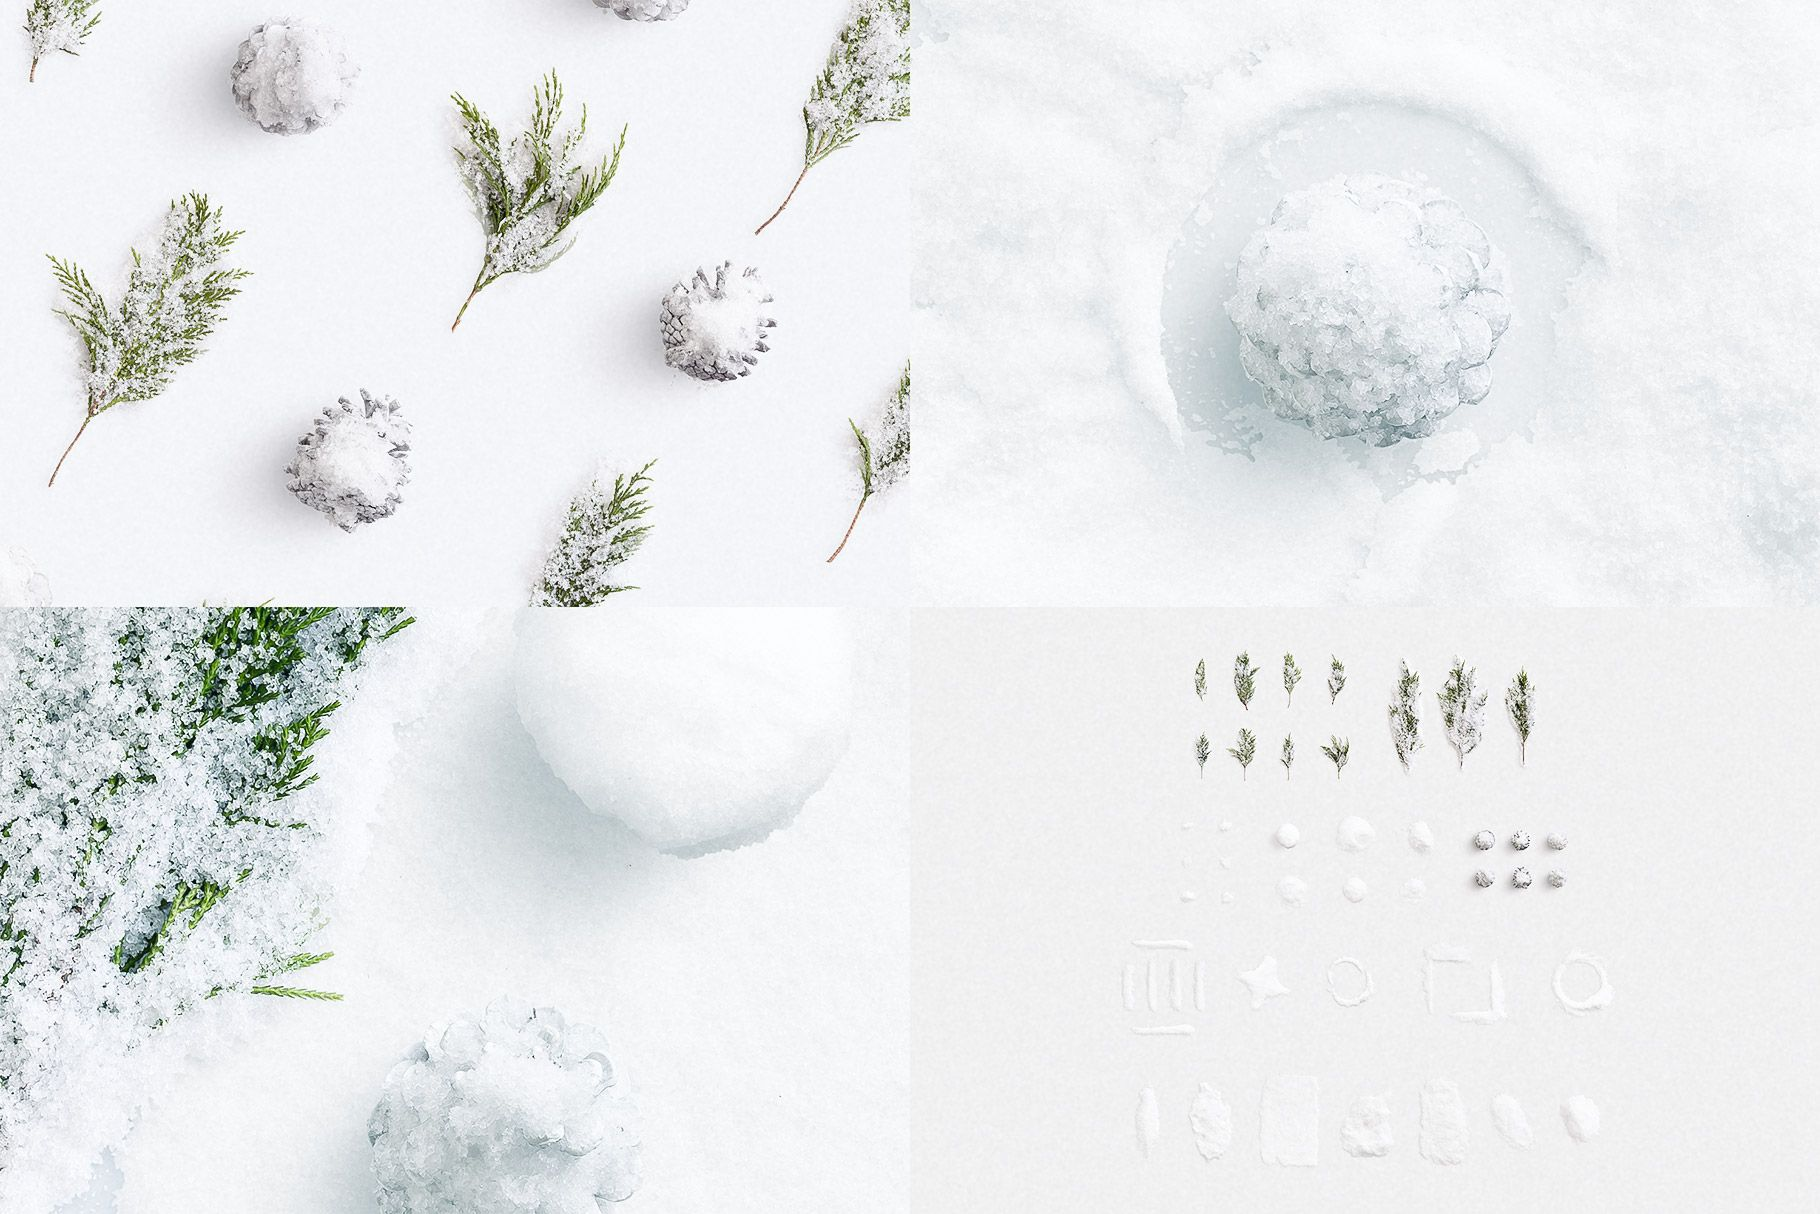 Winter Nature Snow